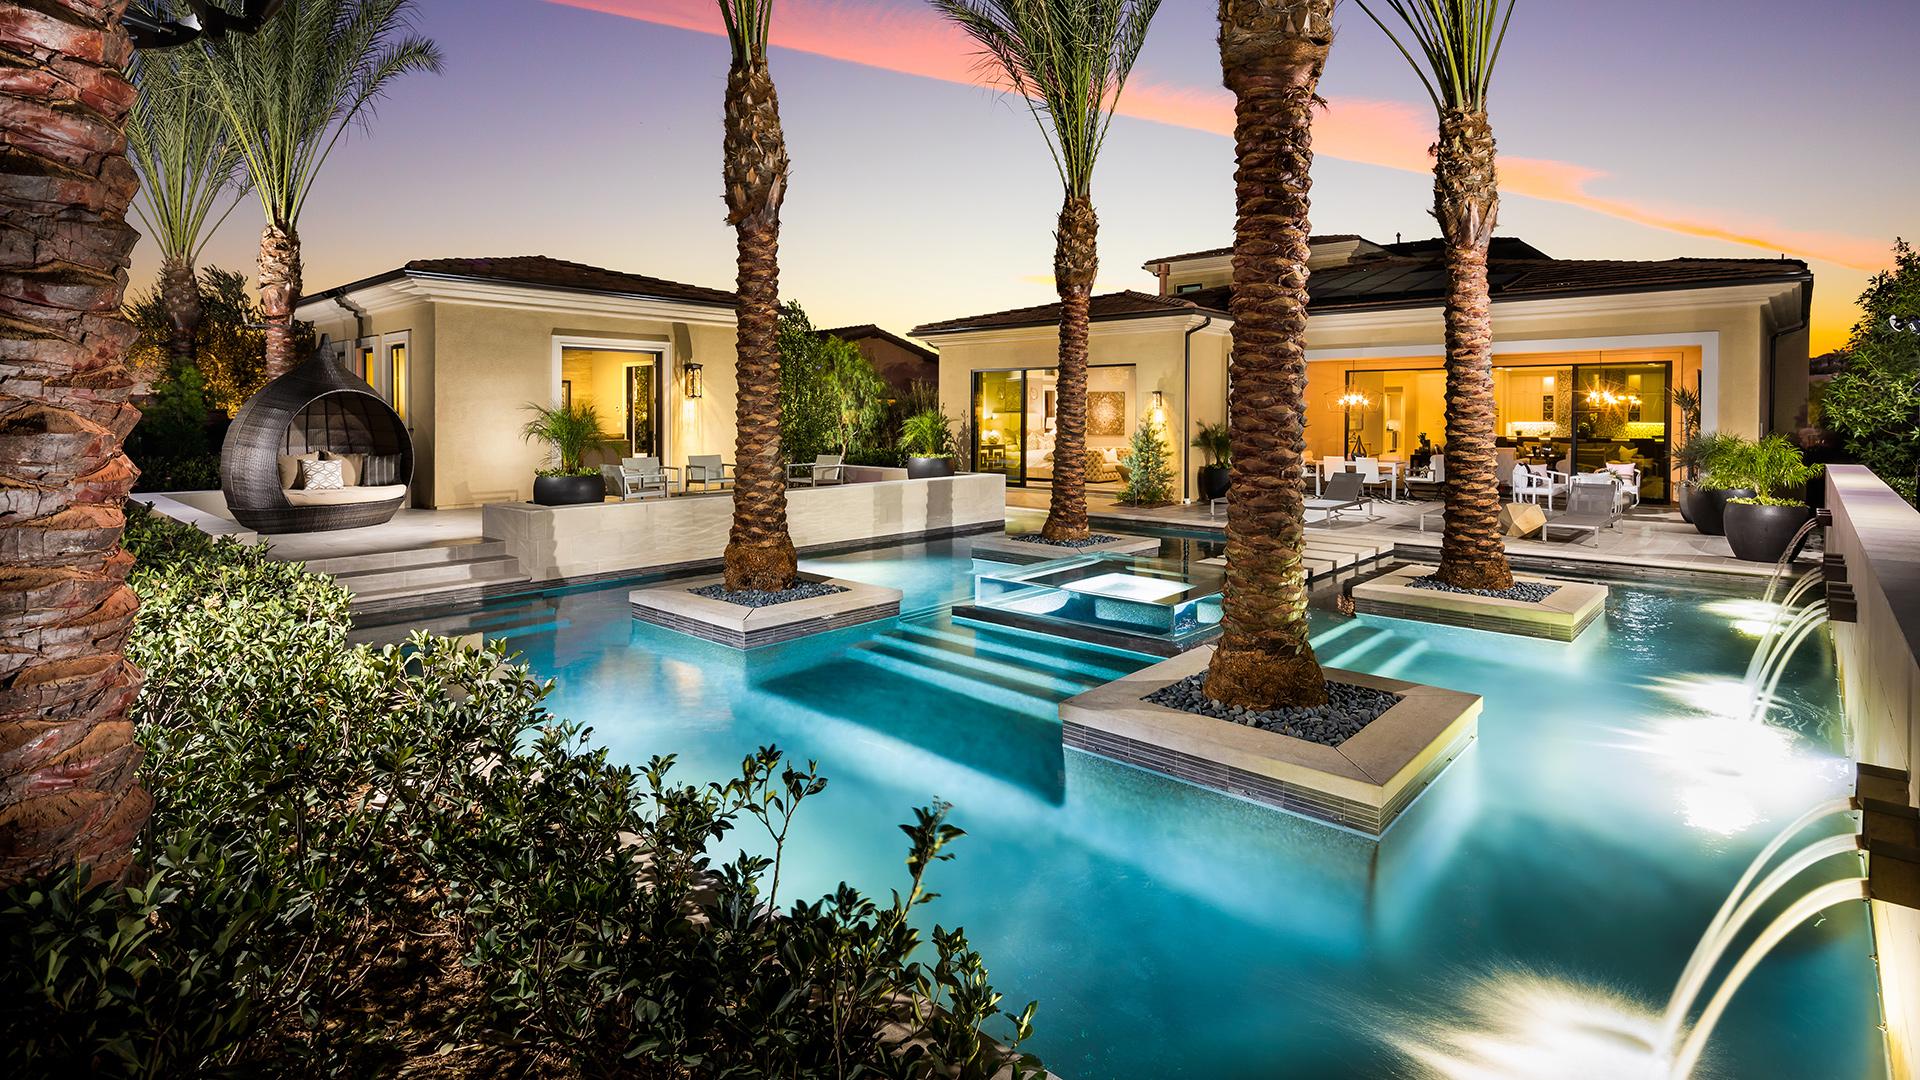 Luxury outdoor living spaces